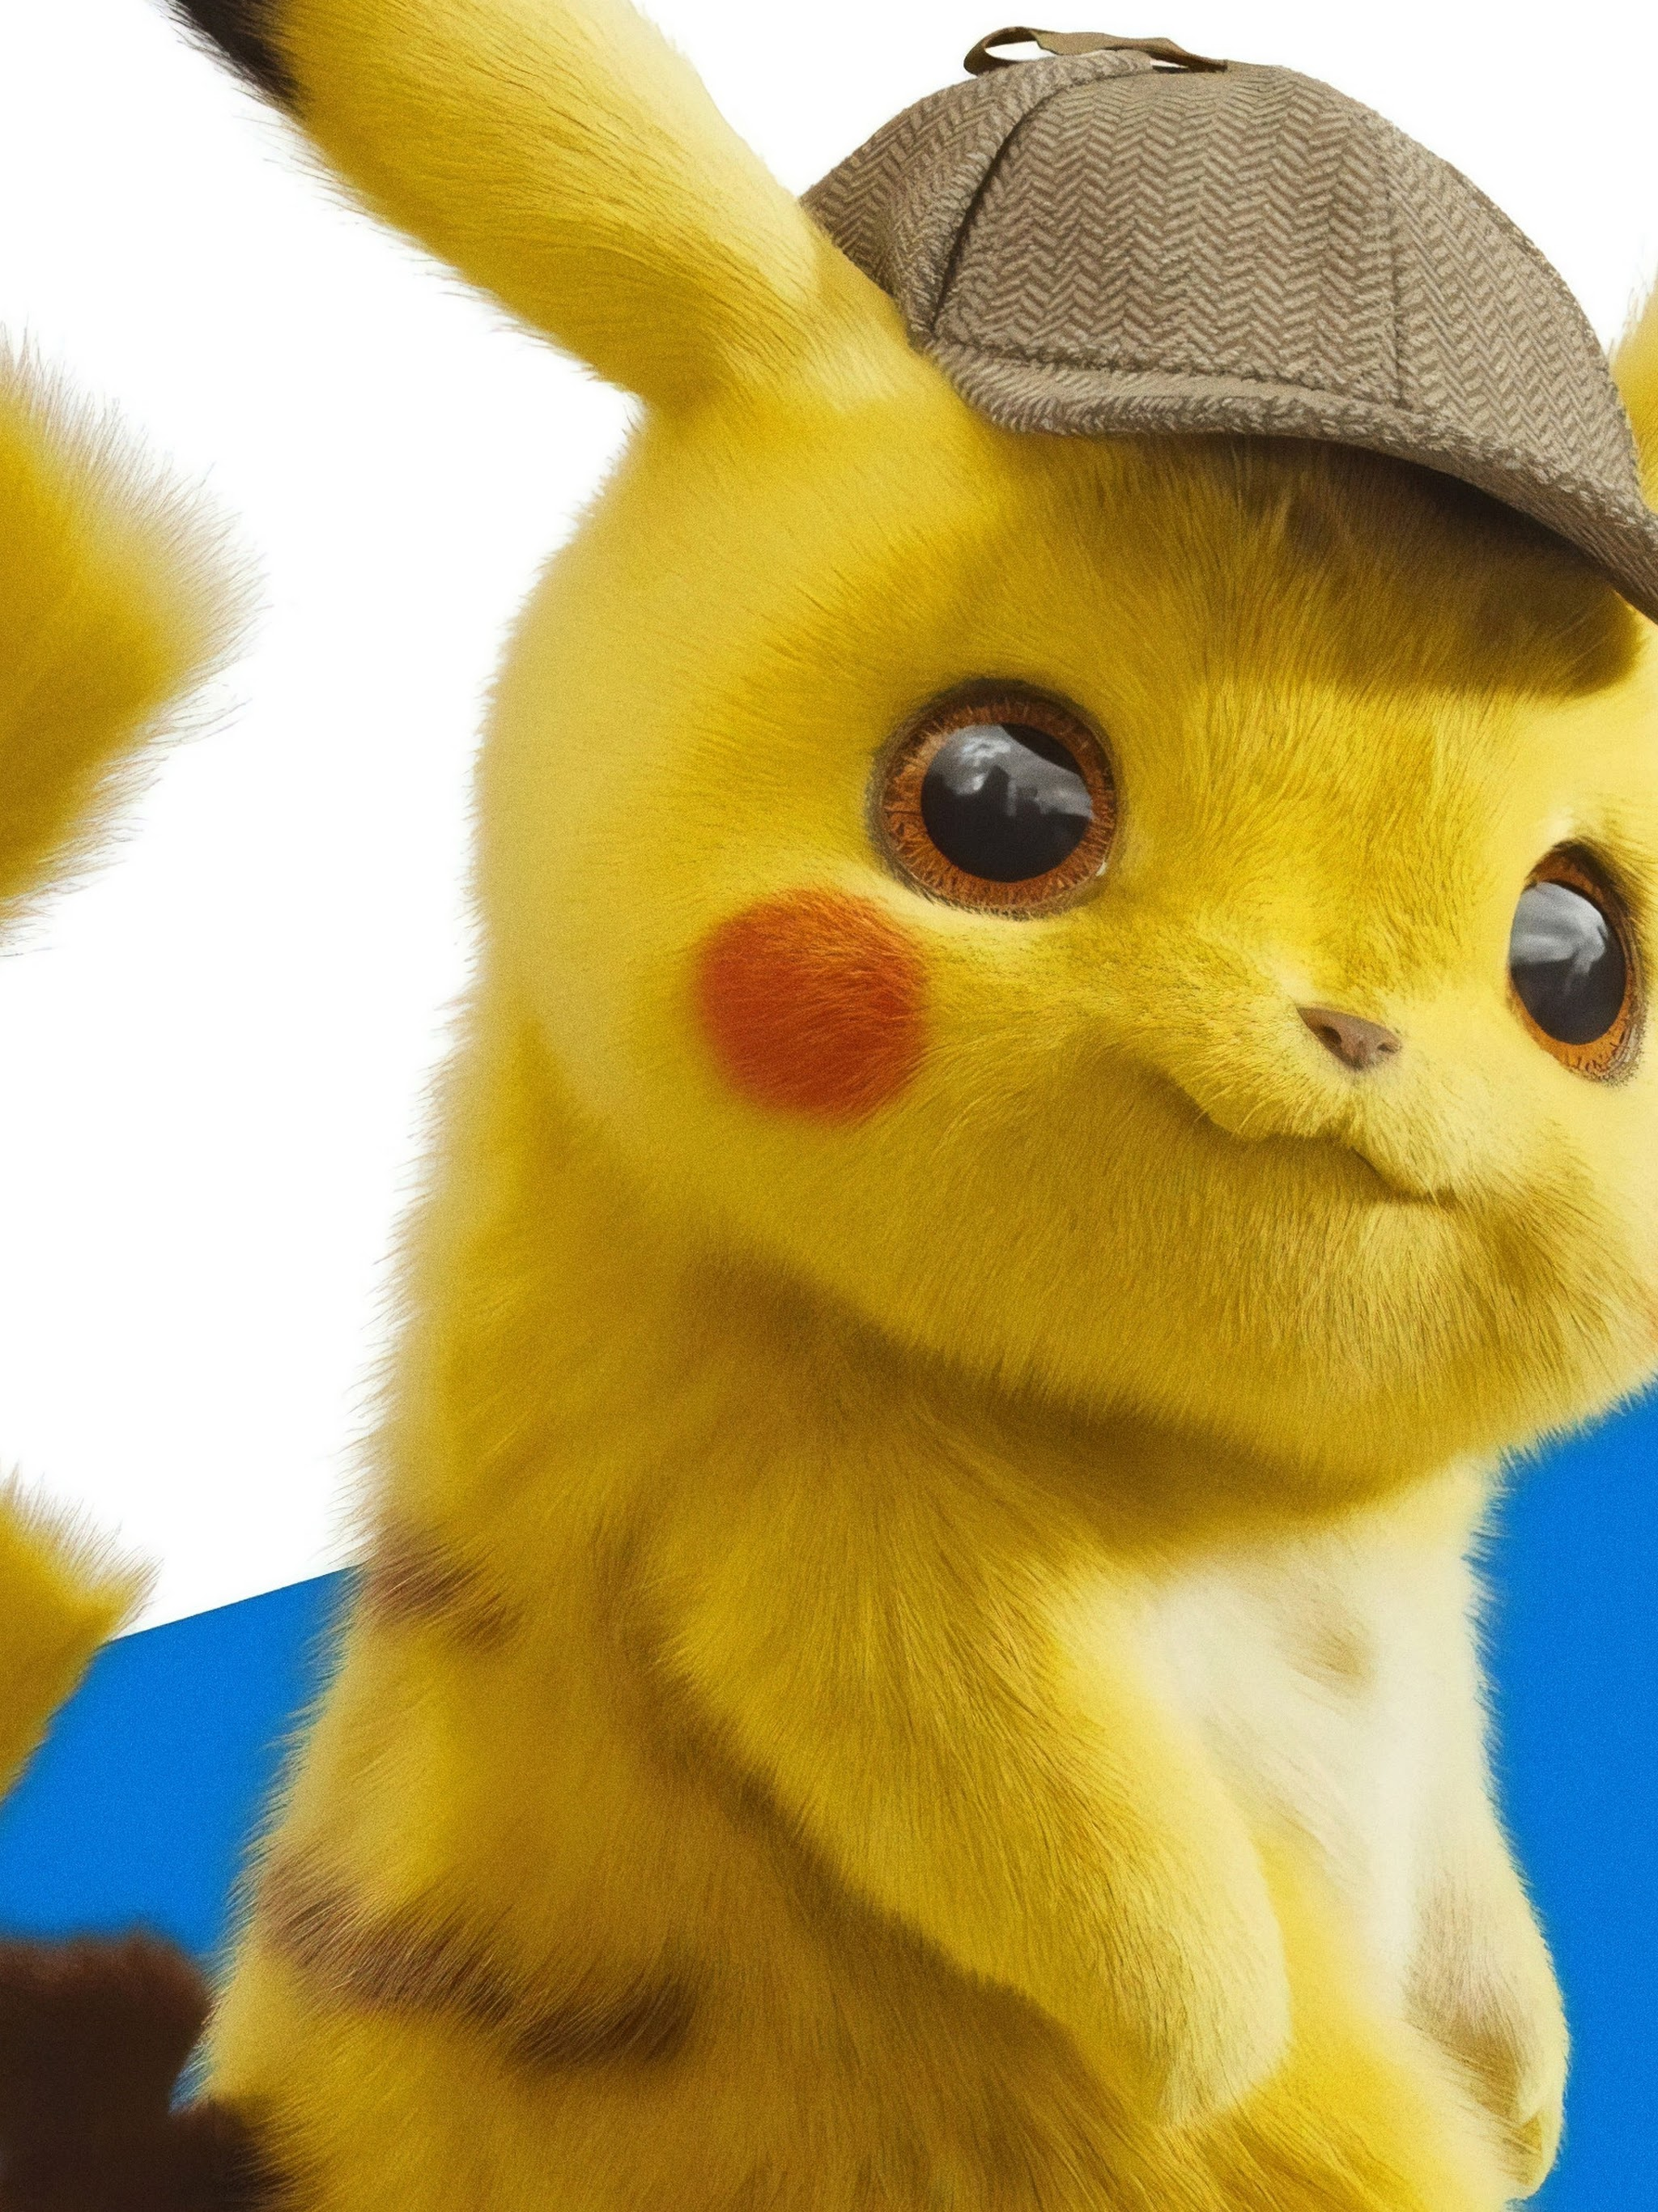 Detective Pikachu 4k Wallpaper 64